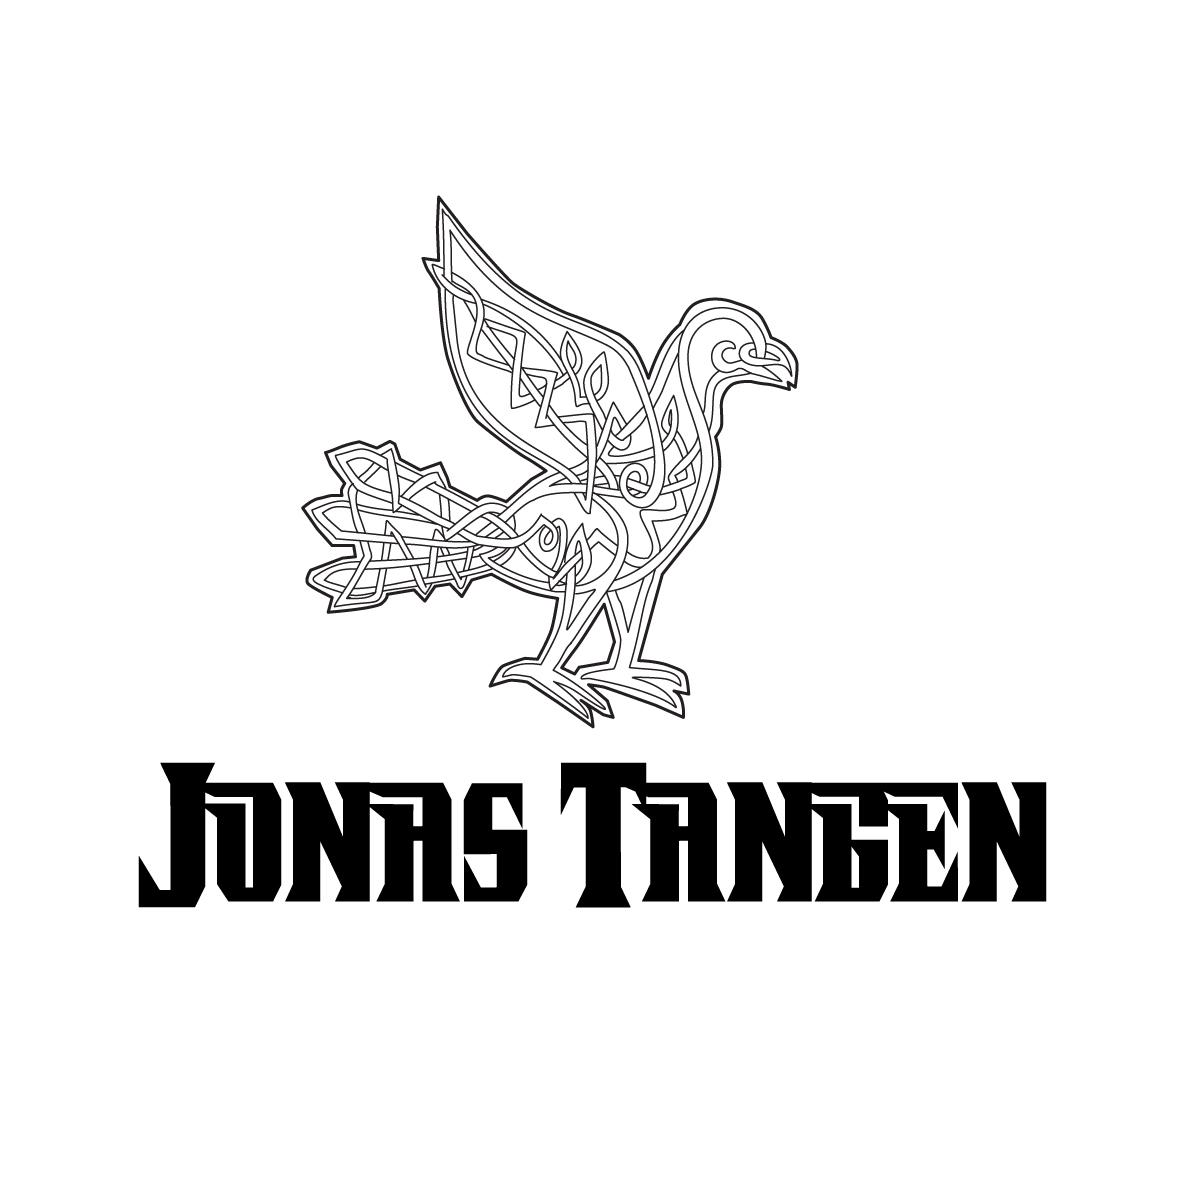 Celtic Rock Bird logo by patrimonio